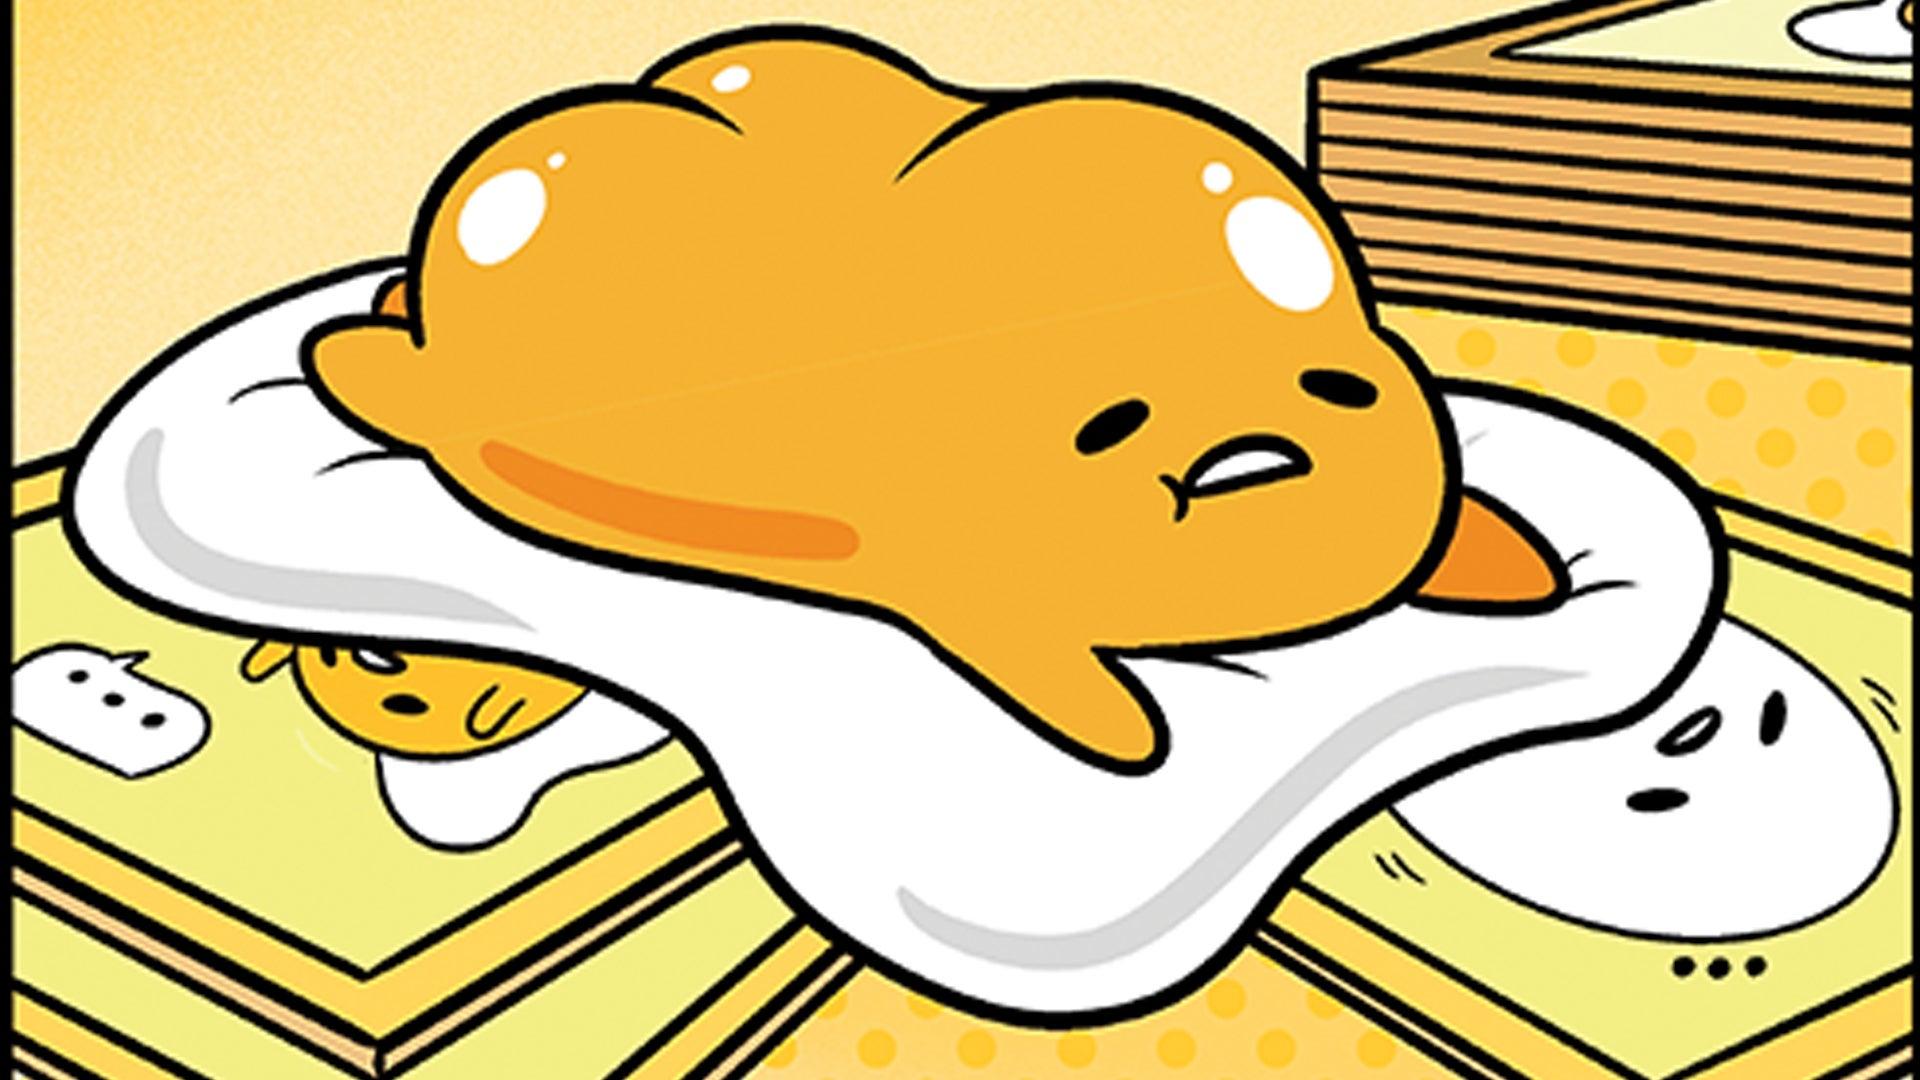 Gudetama: The Tricky Egg Card Game board game artwork